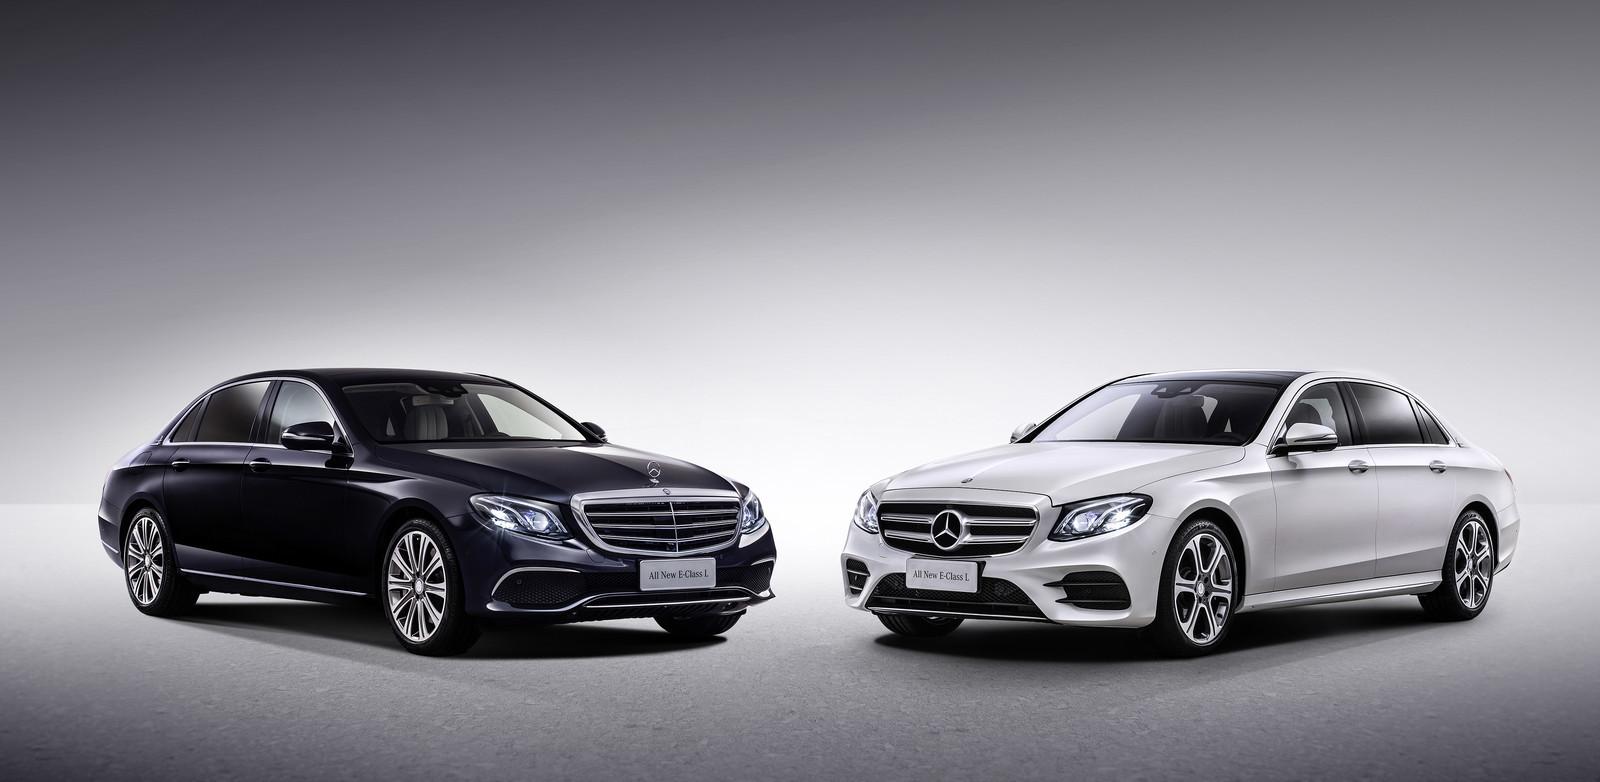 Mercedes-Benz Clase E LWB (11/14)